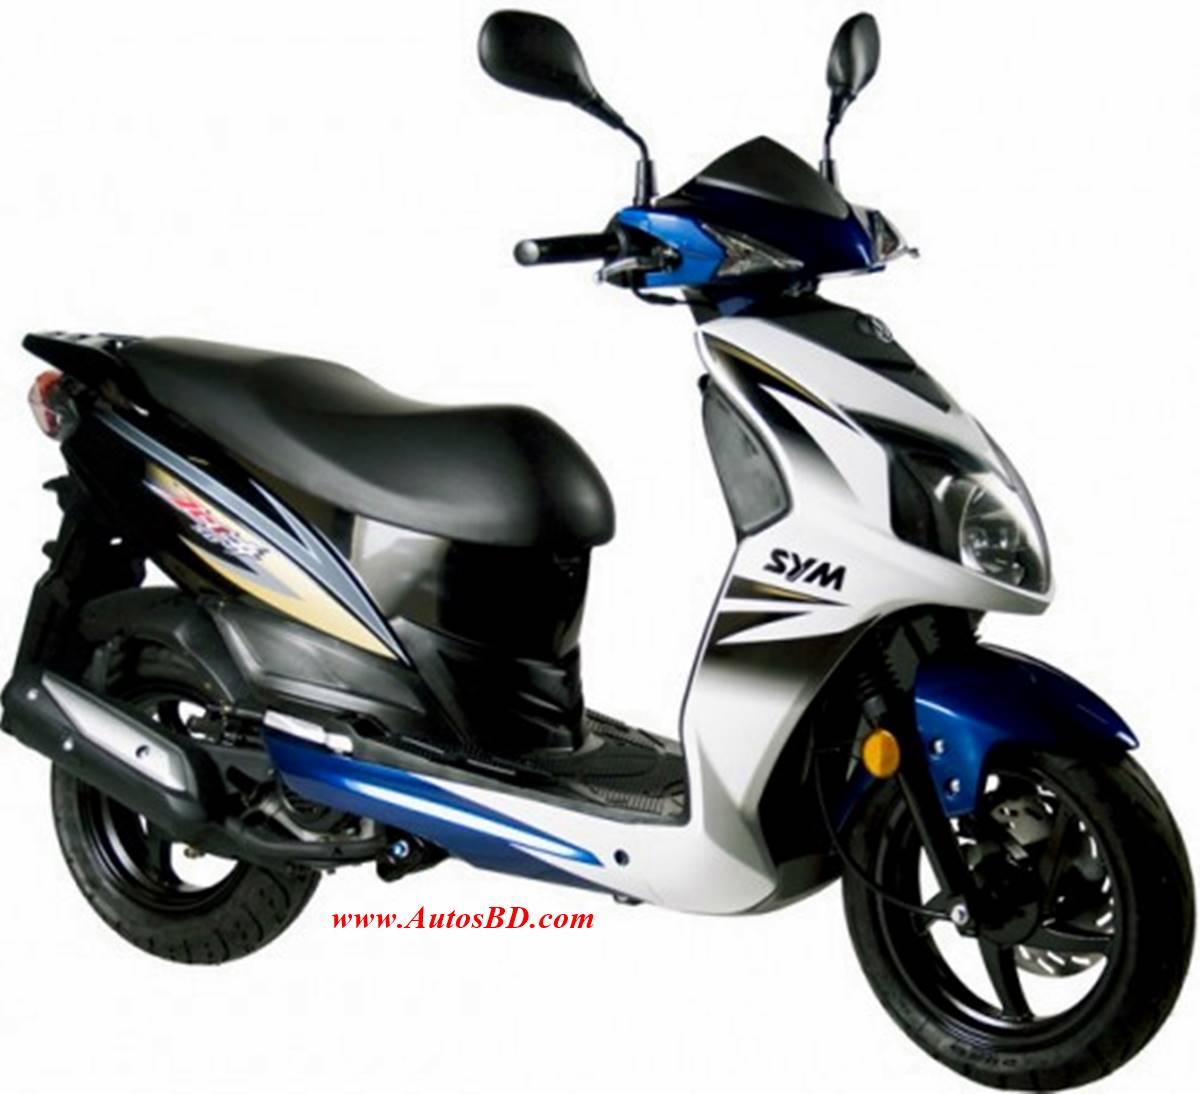 SYM JET 4 125cc Scooter Specification